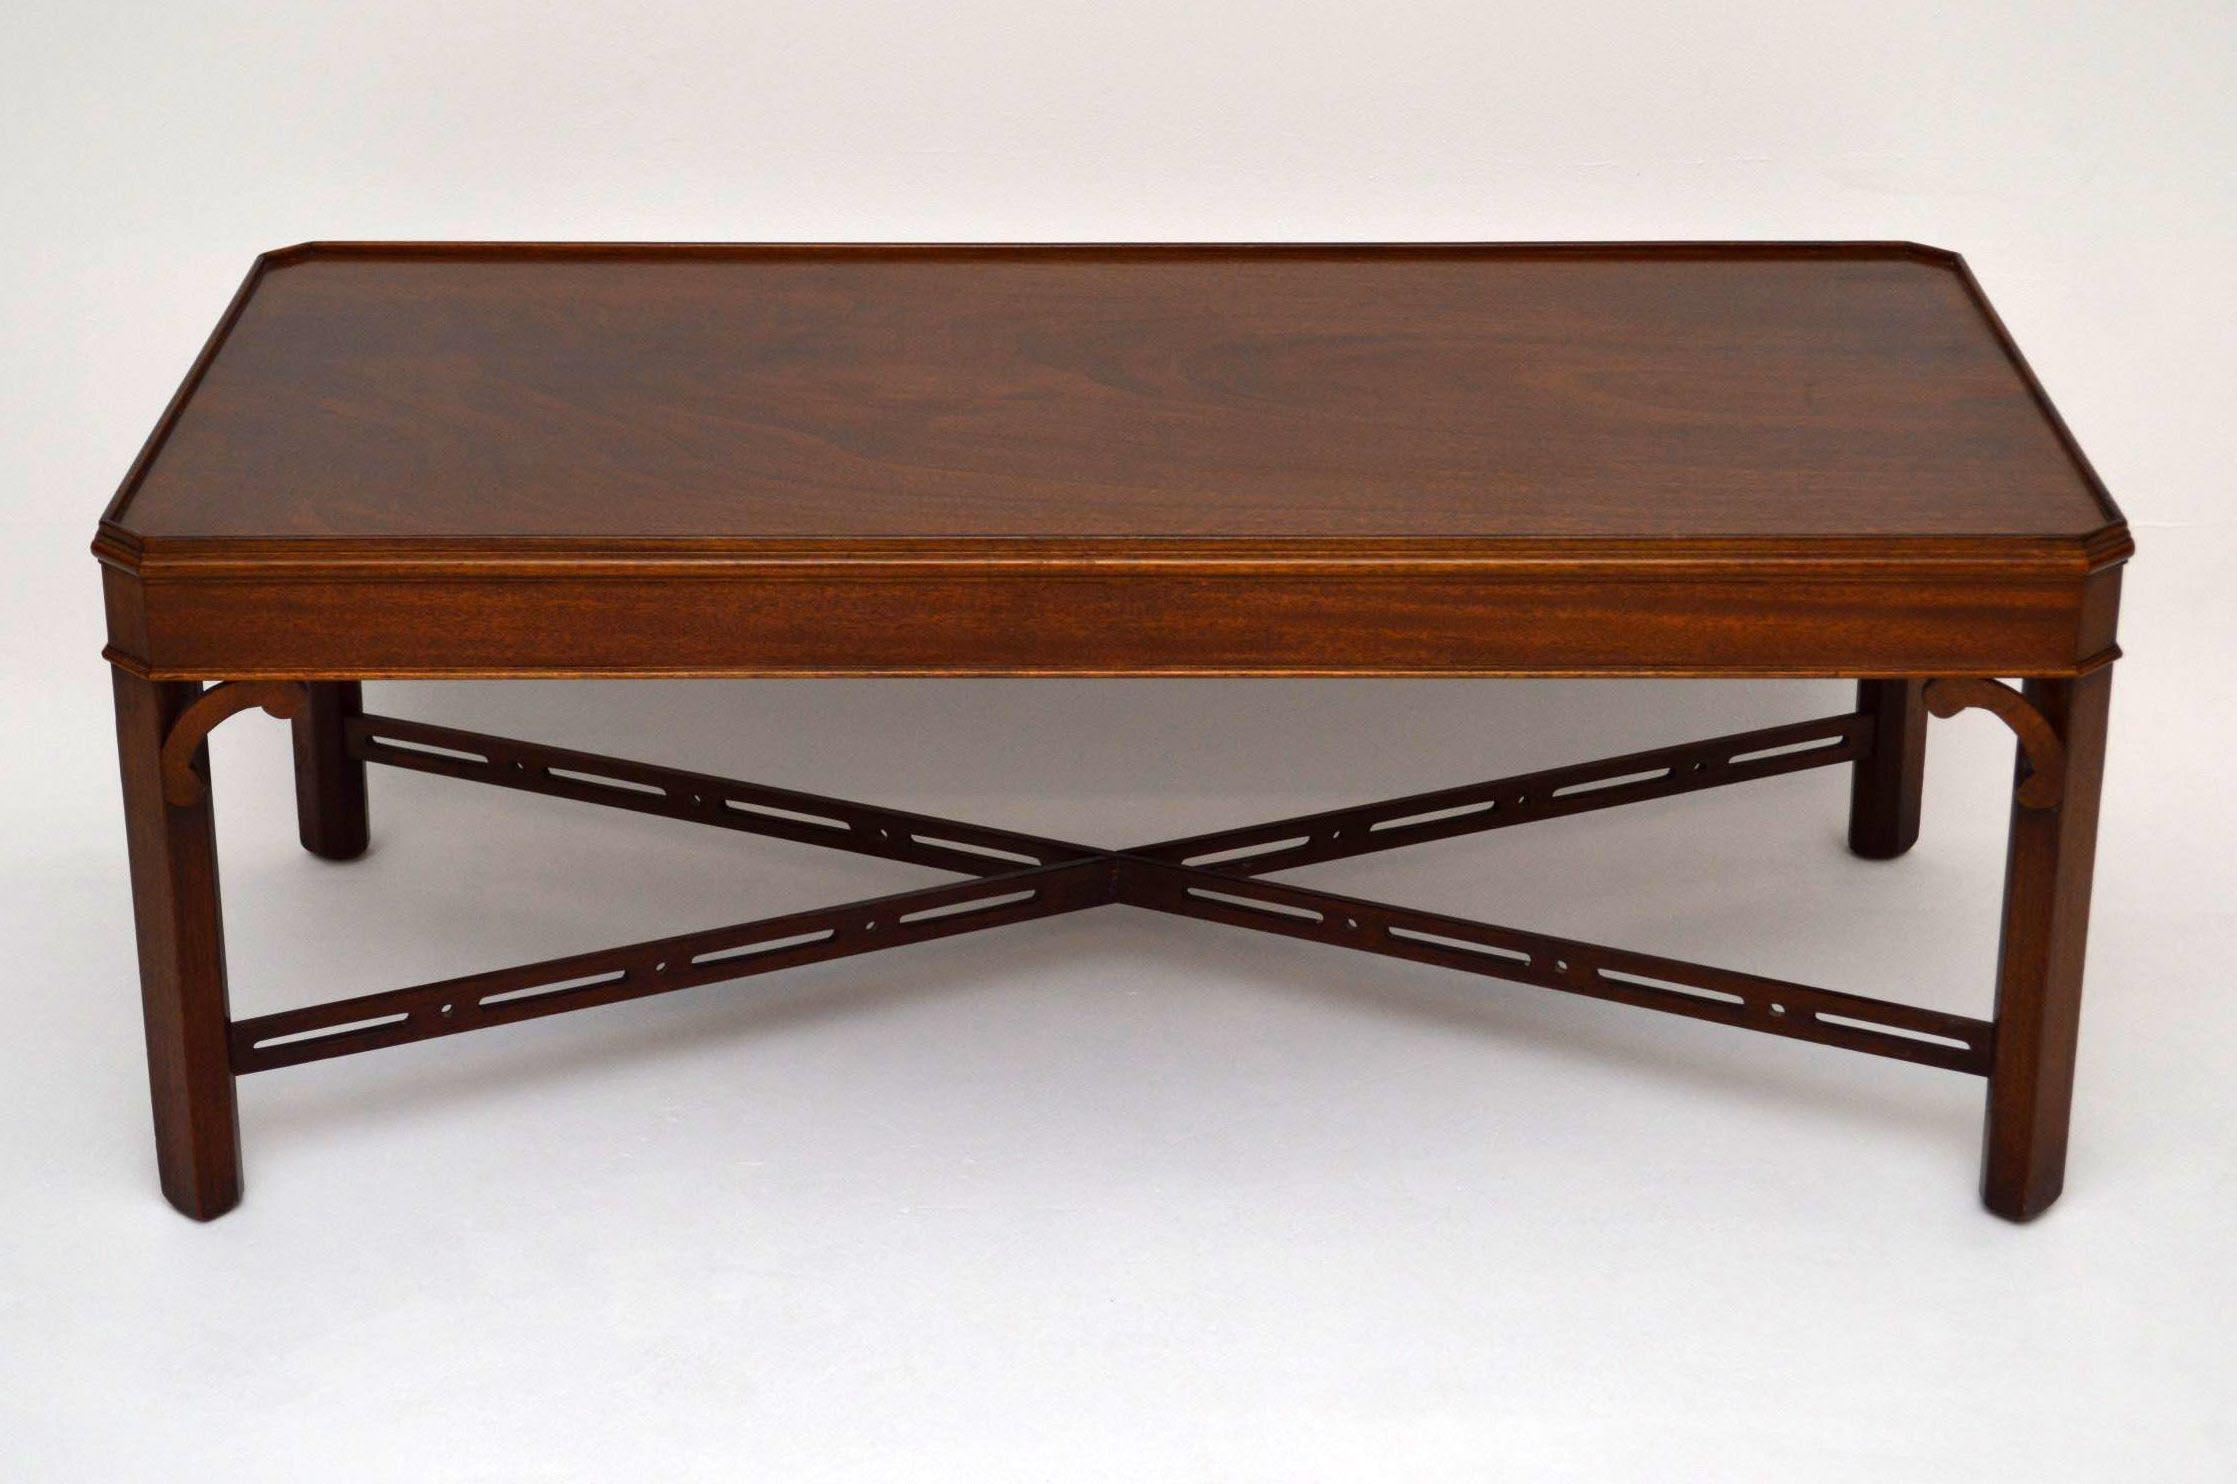 Large Mahogany Coffee Table Coffee Table Design Ideas